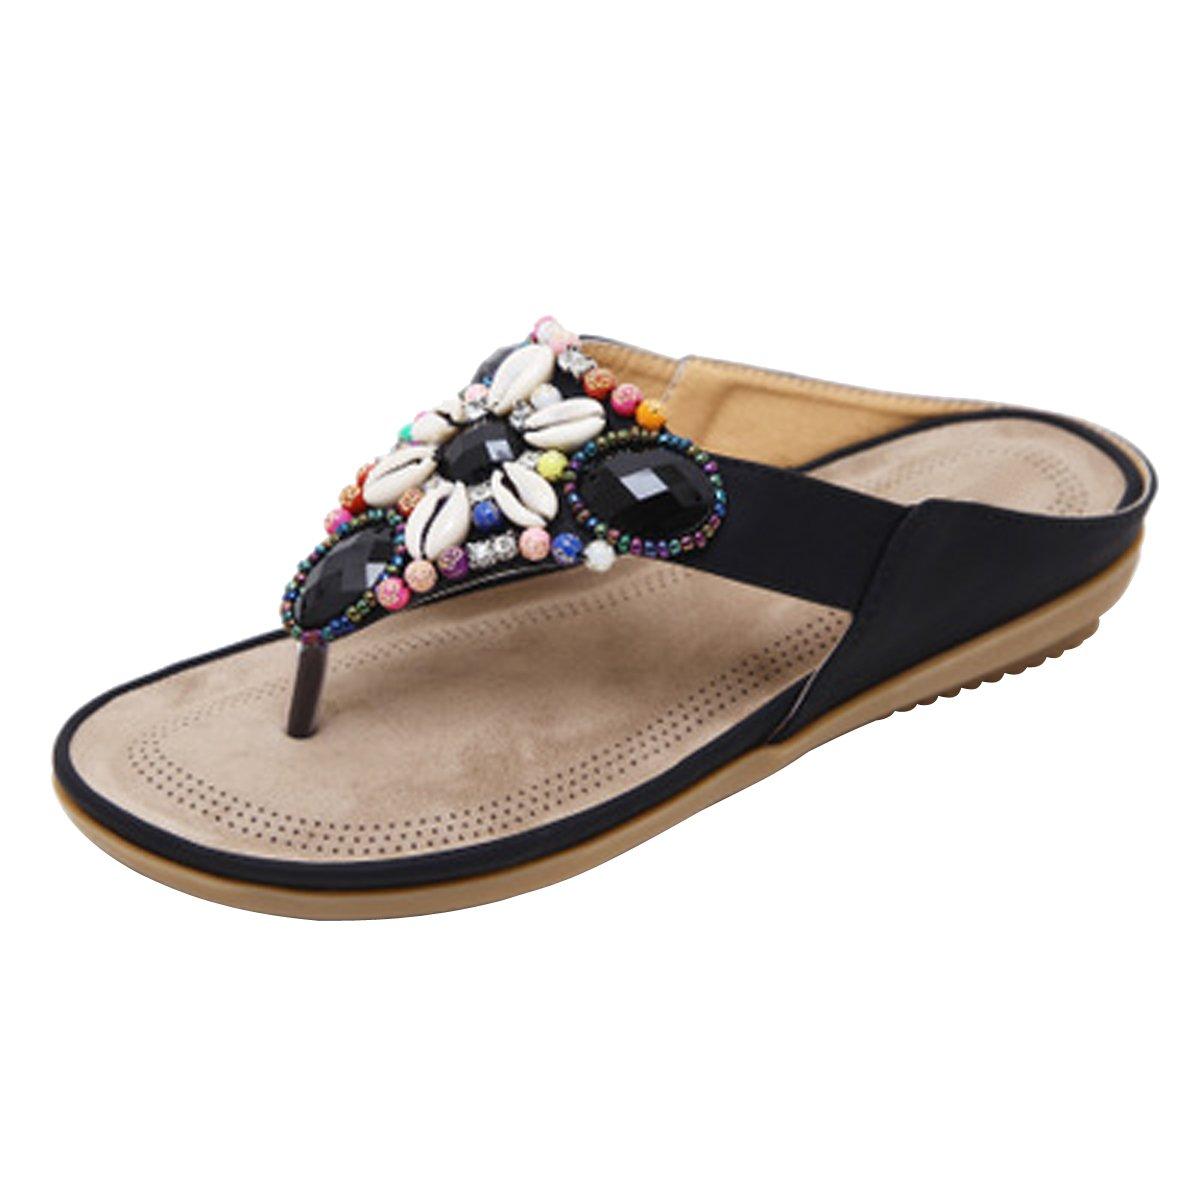 LUXINYU Women Summer Thong Sandal - Bohemia Beaded Flat Slide-on Slipper Flip Flop Shoes - 2 Assorted Color,Black US 5.5